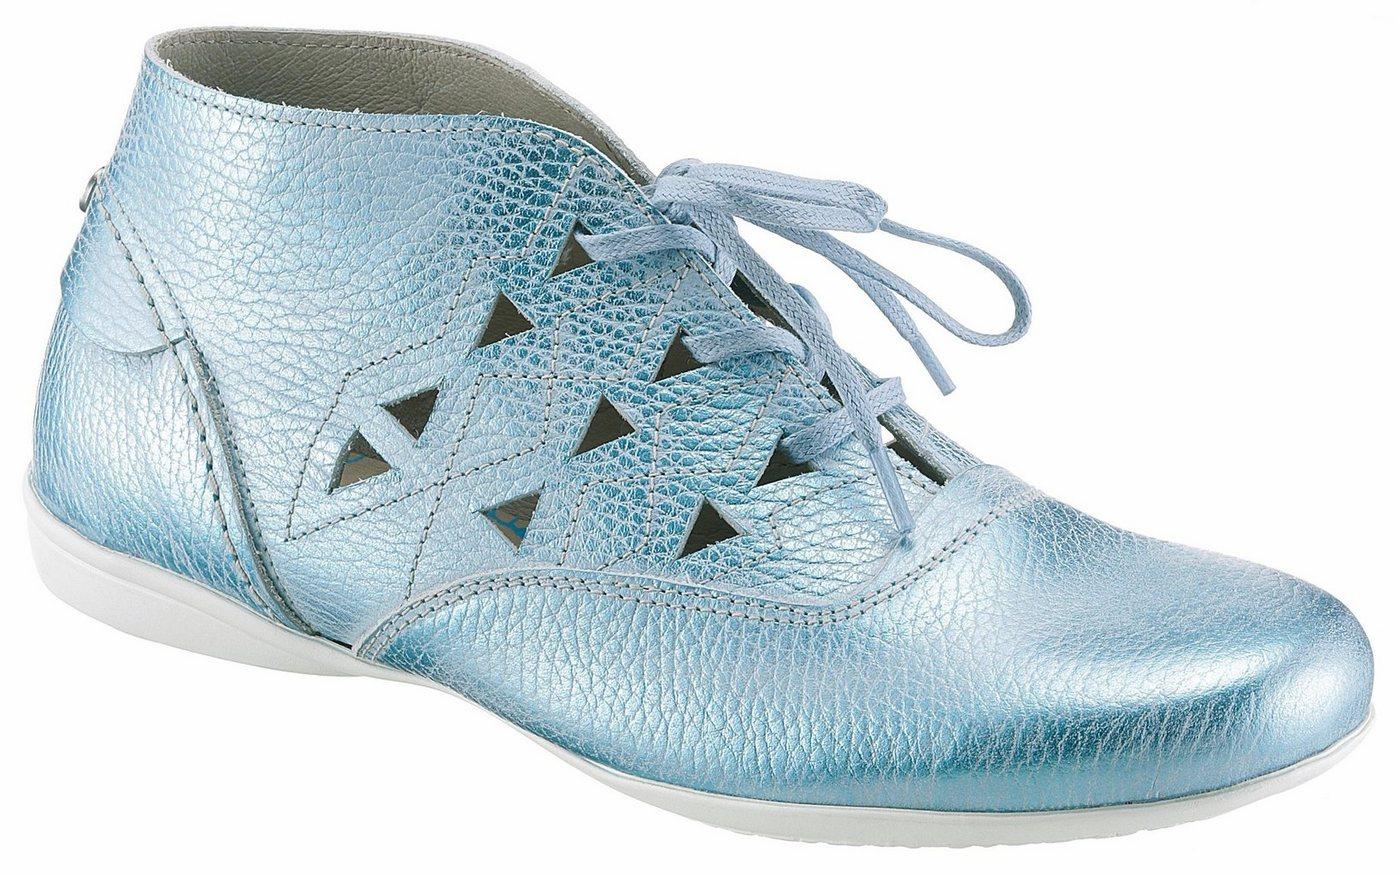 DKODE »Flick« Sommerboots mit dezenten Lasercut | Schuhe > Boots > Sommerboots | Blau | Leder - Jeans | DKODE